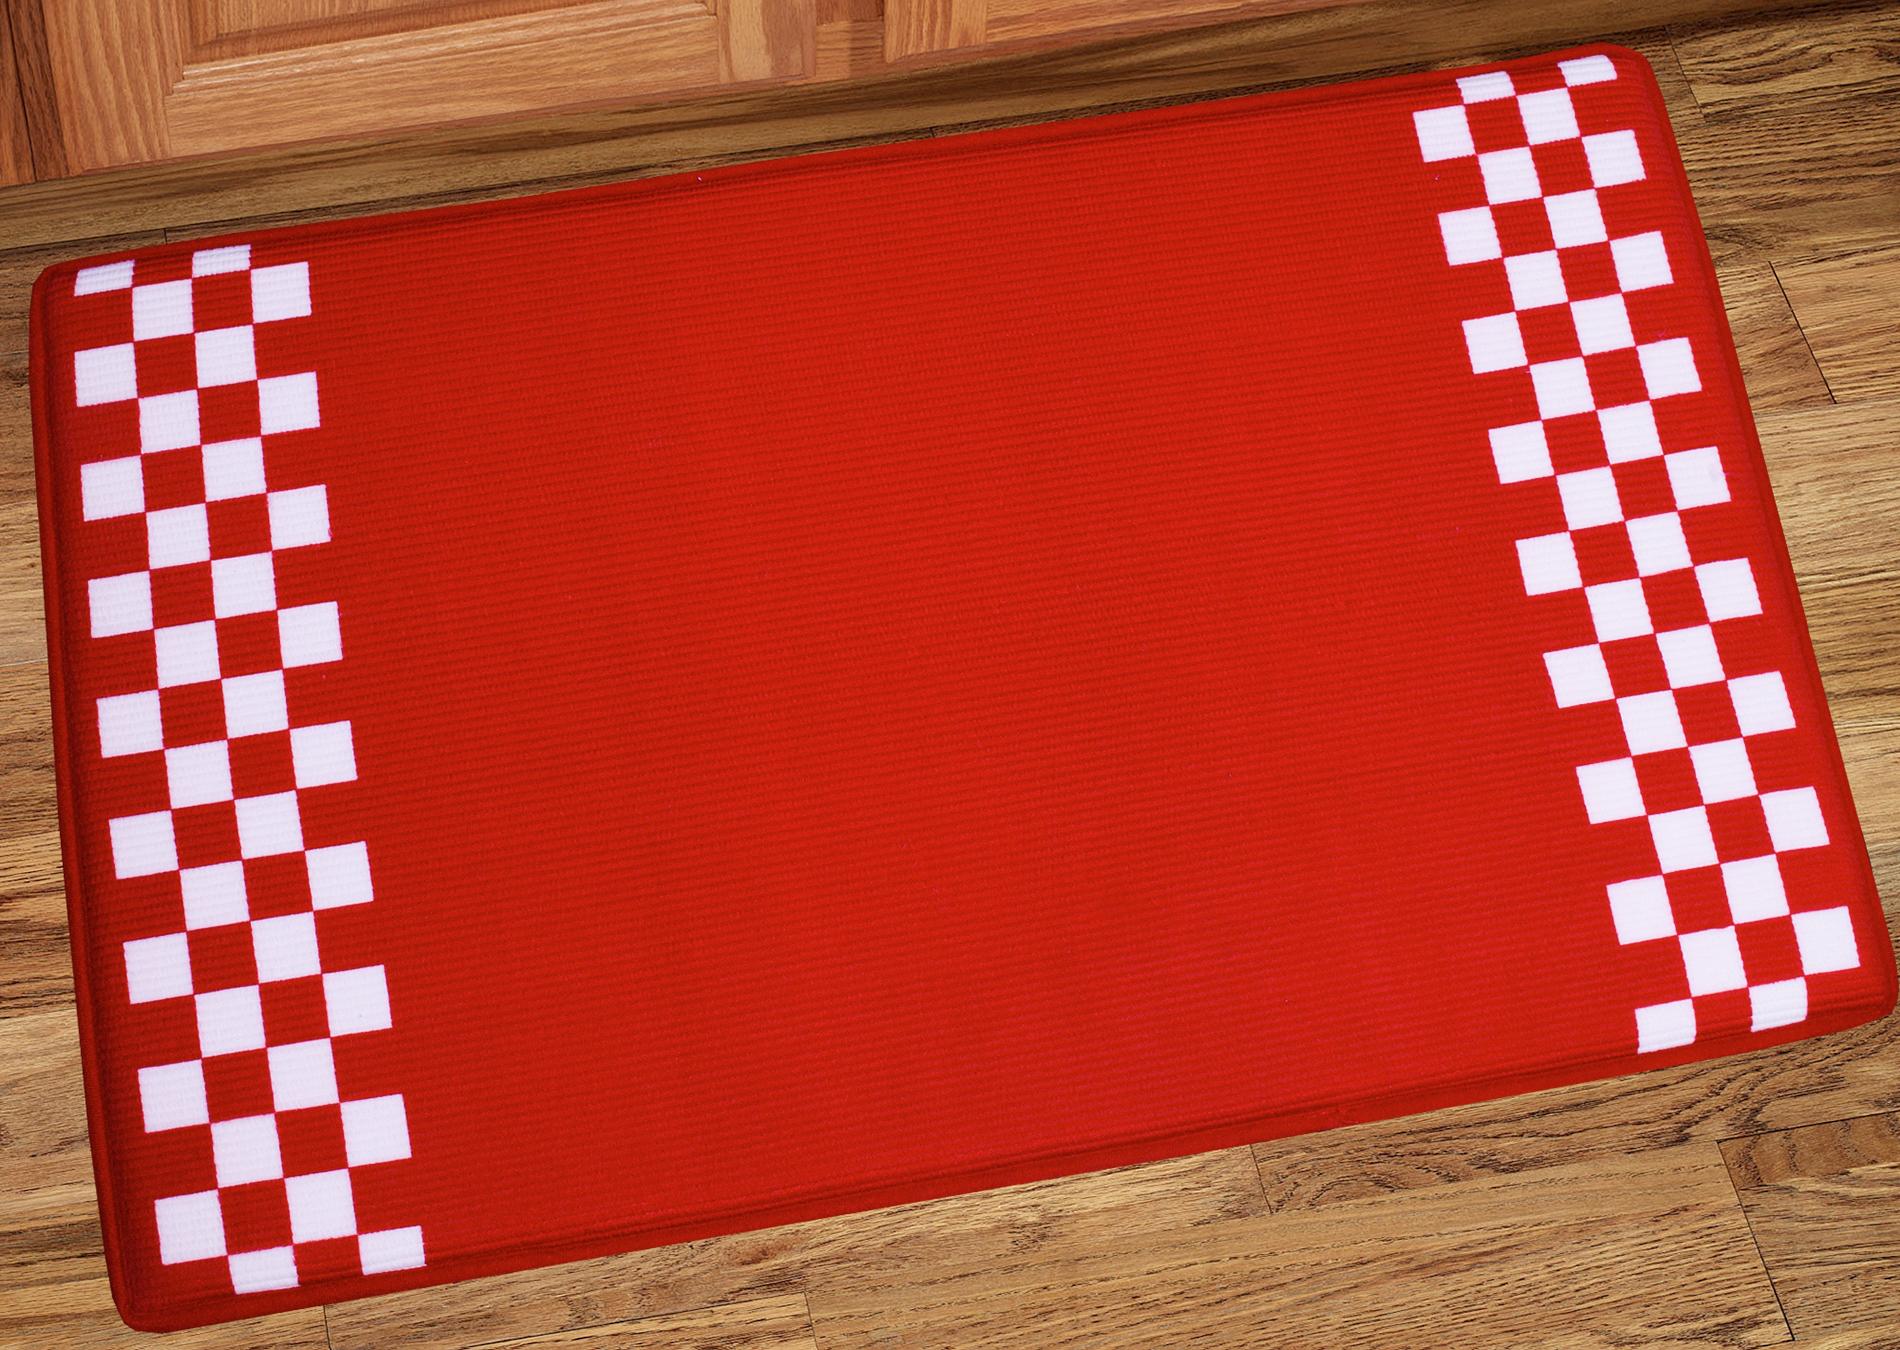 Memory foam kitchen floor mat photo - 3